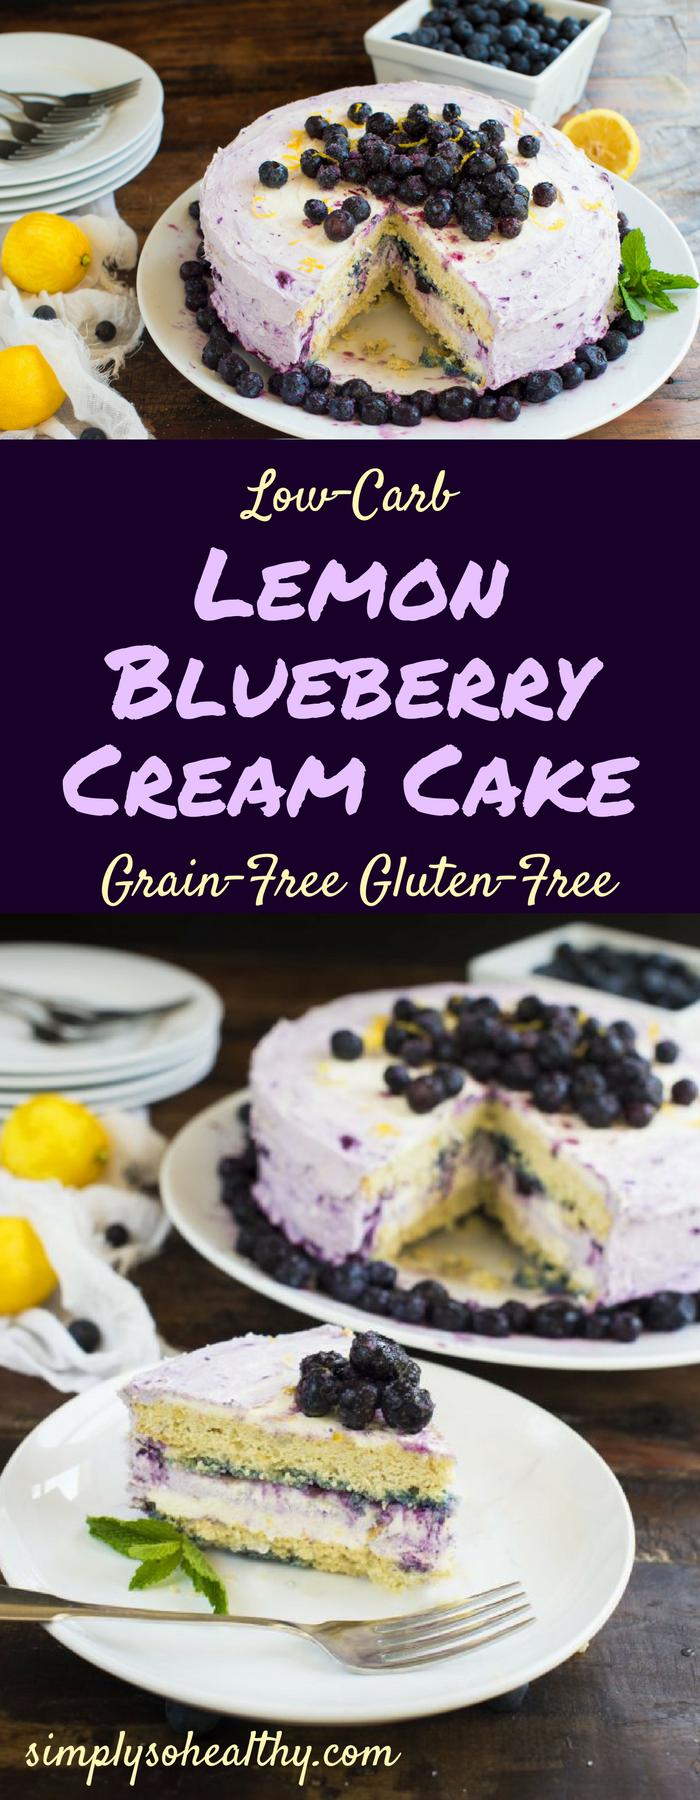 LemonBlueberryCream Cake